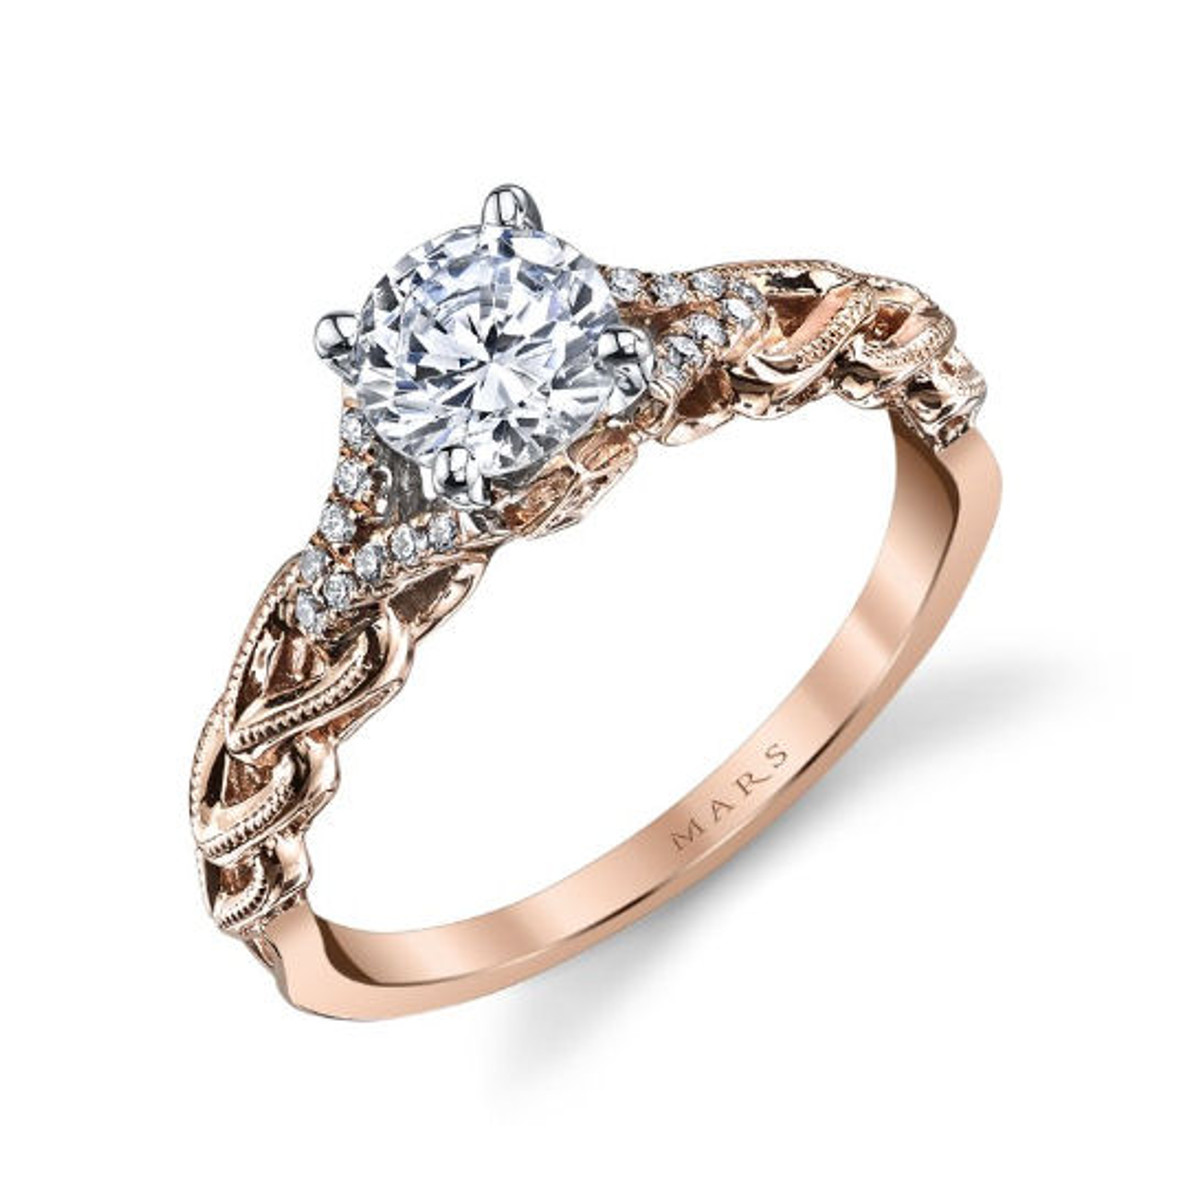 Braided Interwoven Diamond Engagement Ring